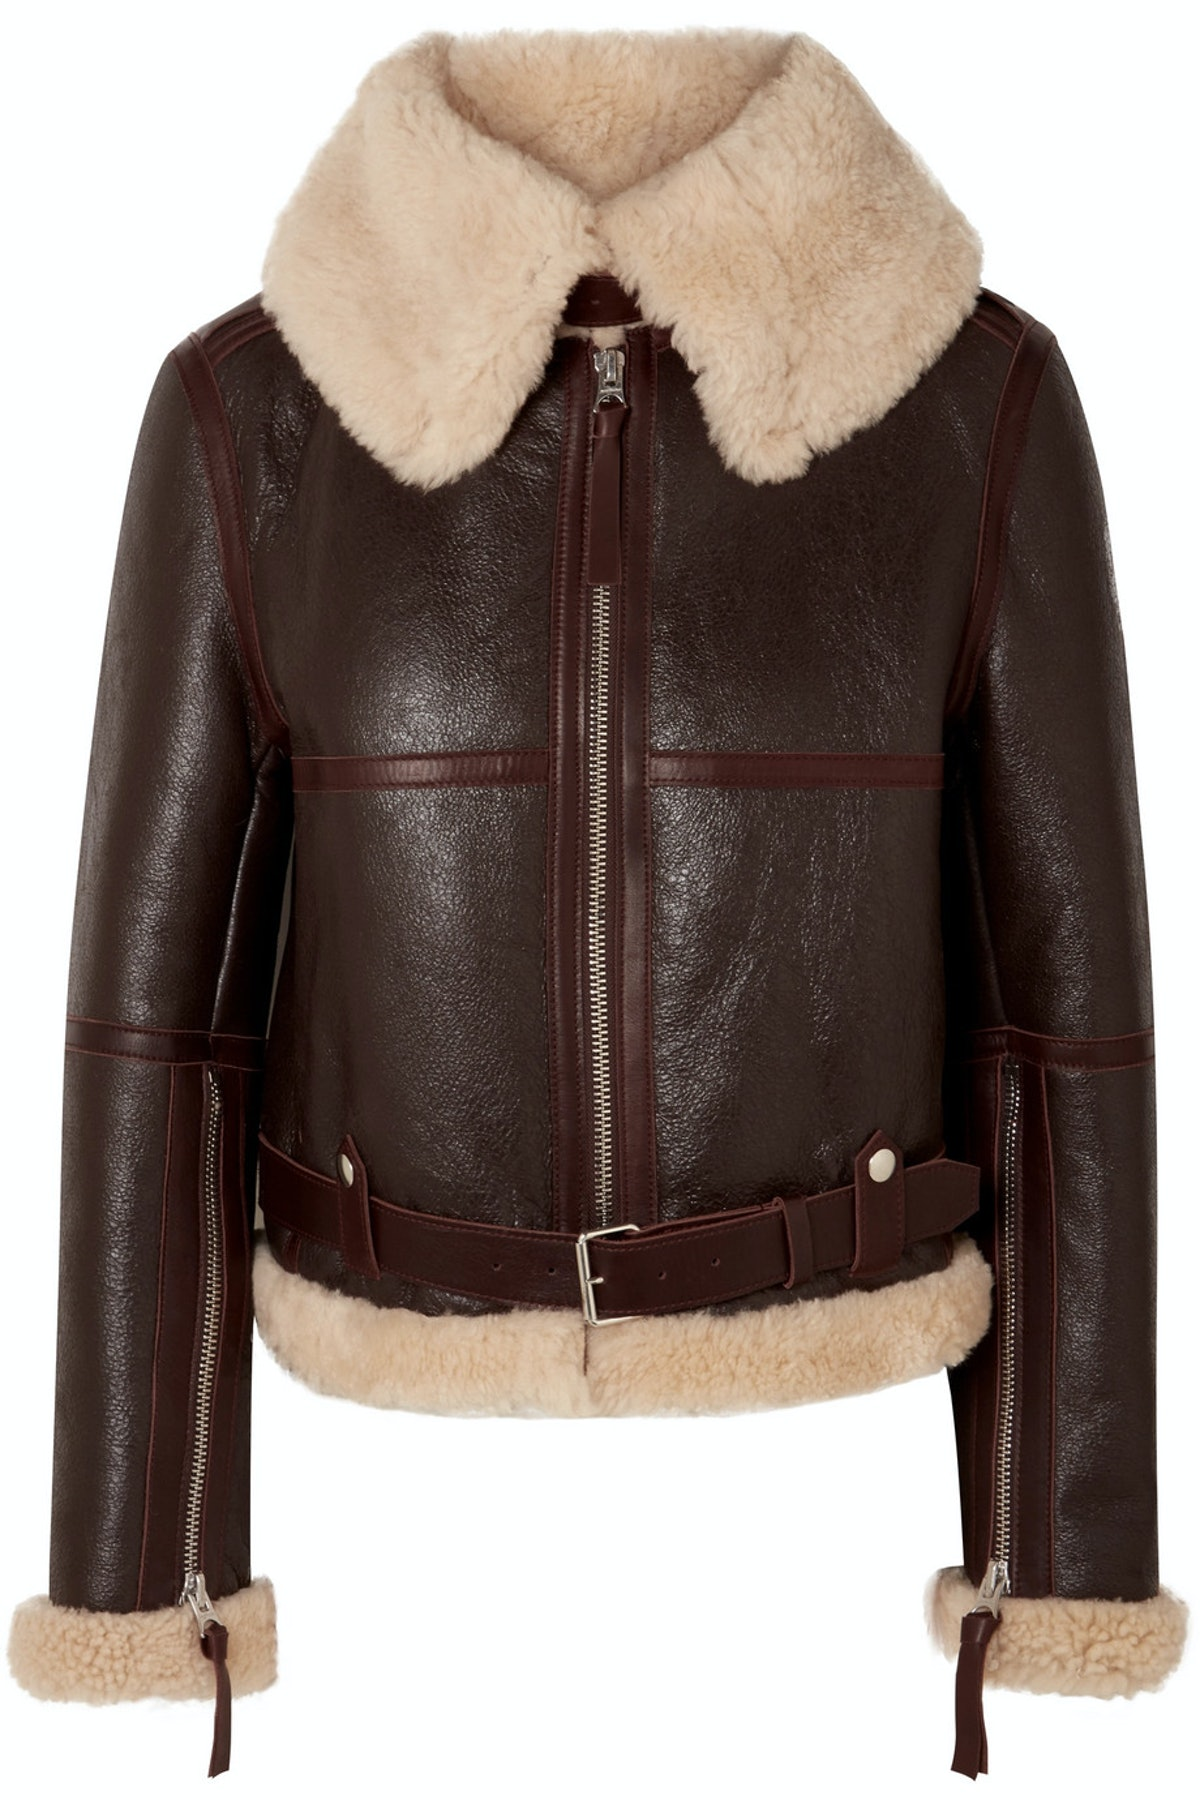 Midsize Shearling Jacket